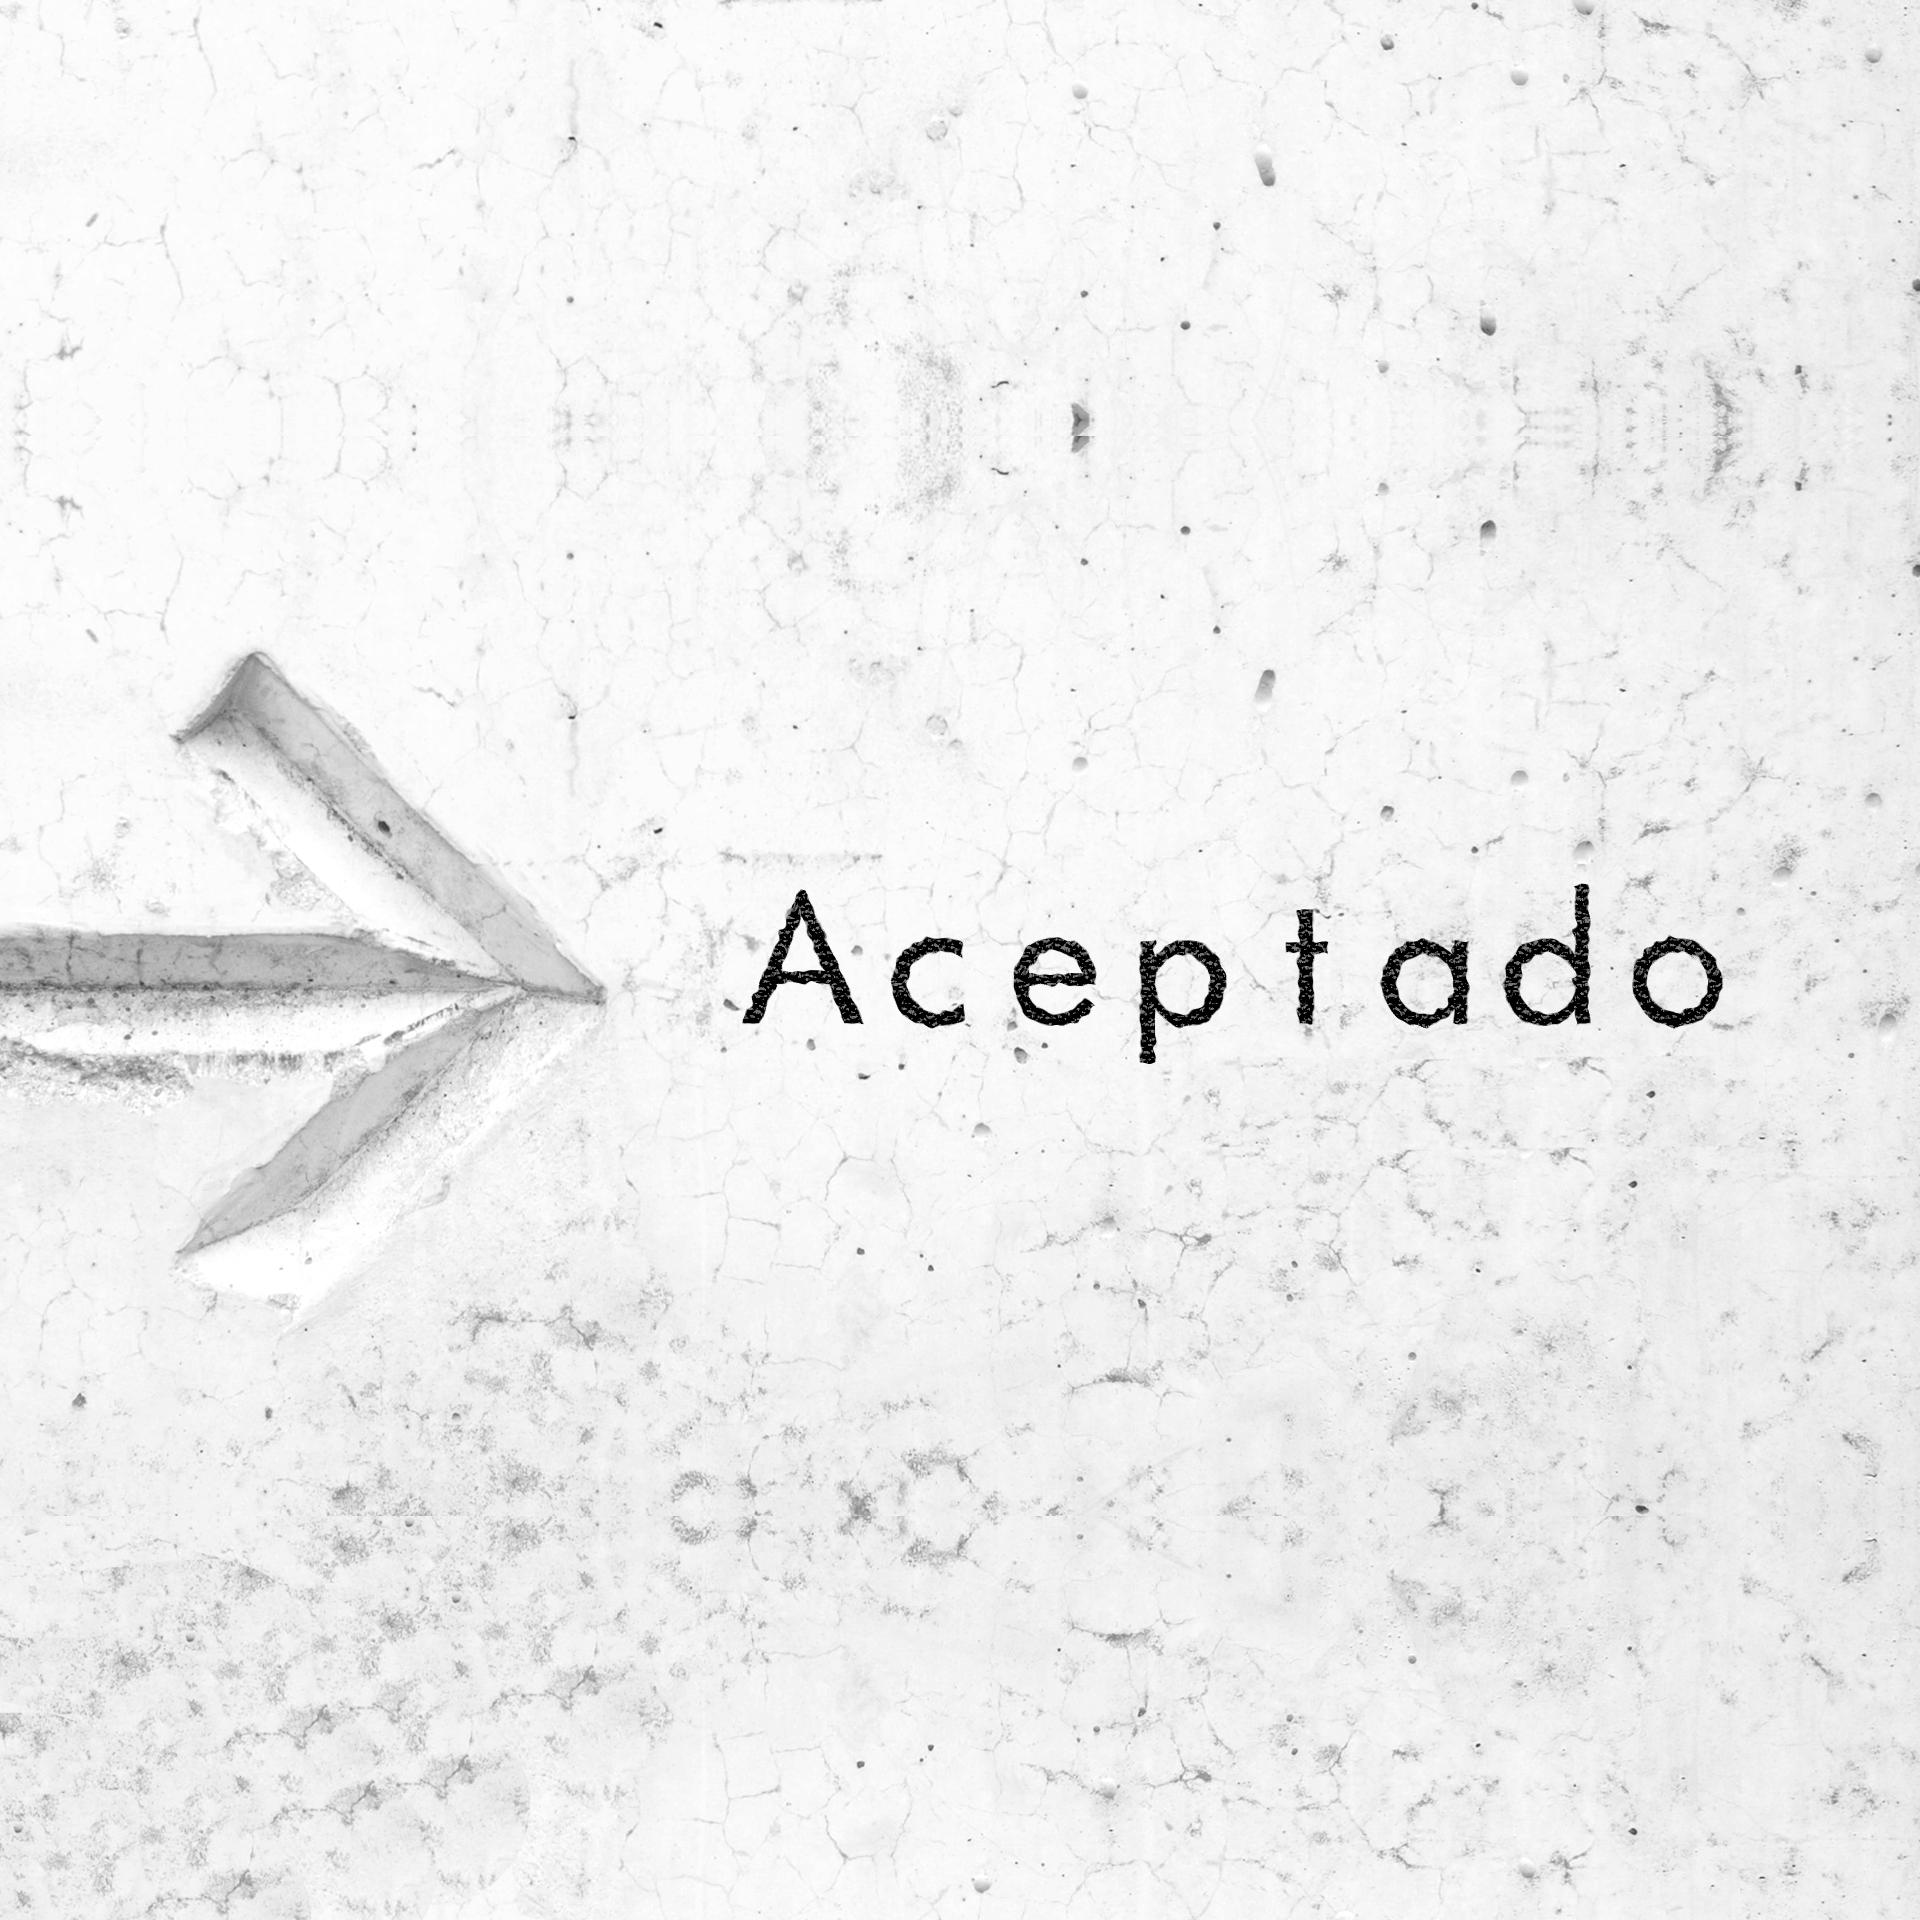 Aceptado - WEB.png